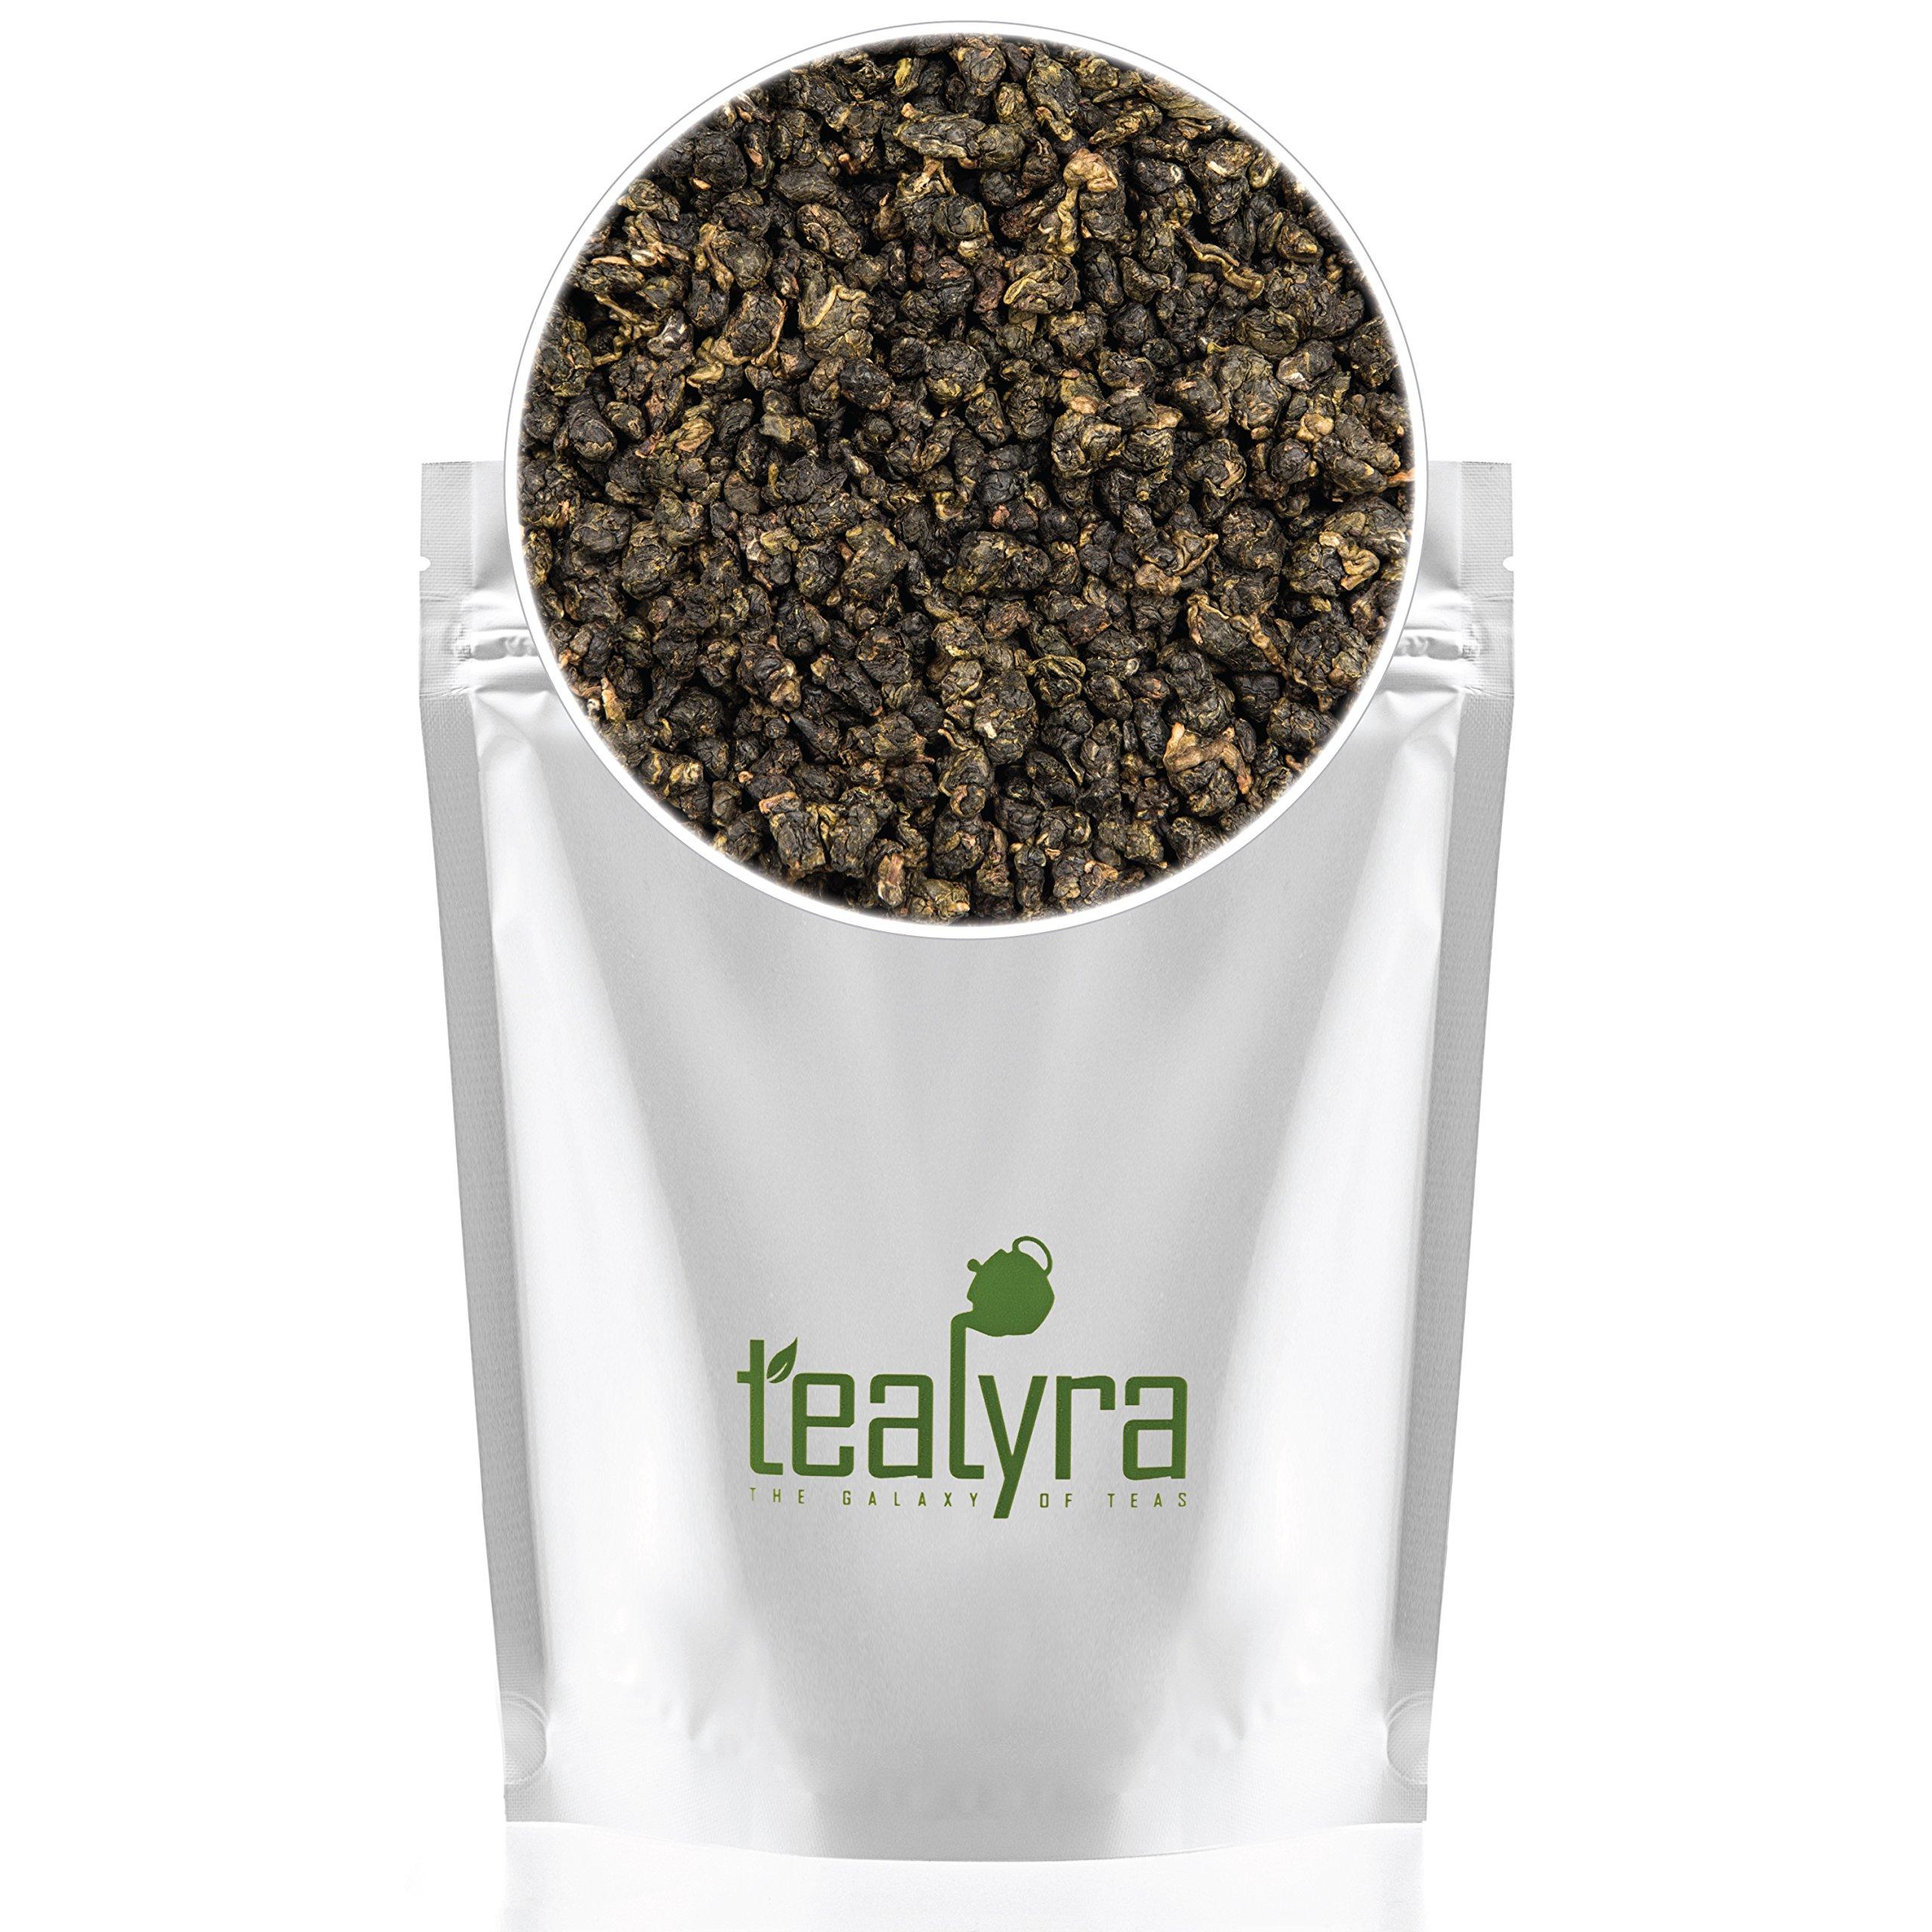 Tealyra - Milk Jin Xuan Oolong - High Mountain Taiwanese Loose Leaf Tea - Great Milky Cream Taste and Aroma - Organically Grown - Weight Loss Tea - 200g (7-ounce) by Tealyra (Image #6)